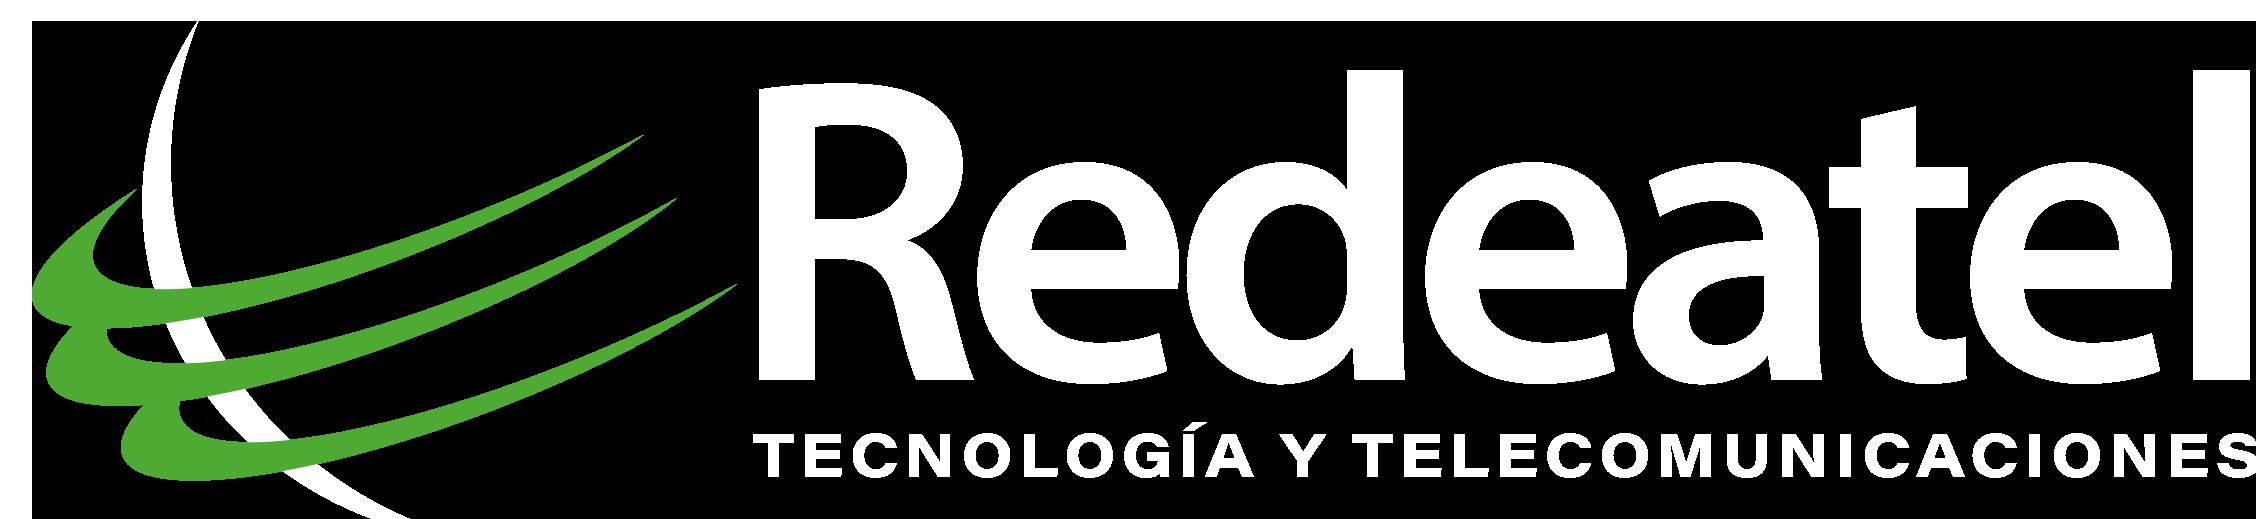 Redeatel